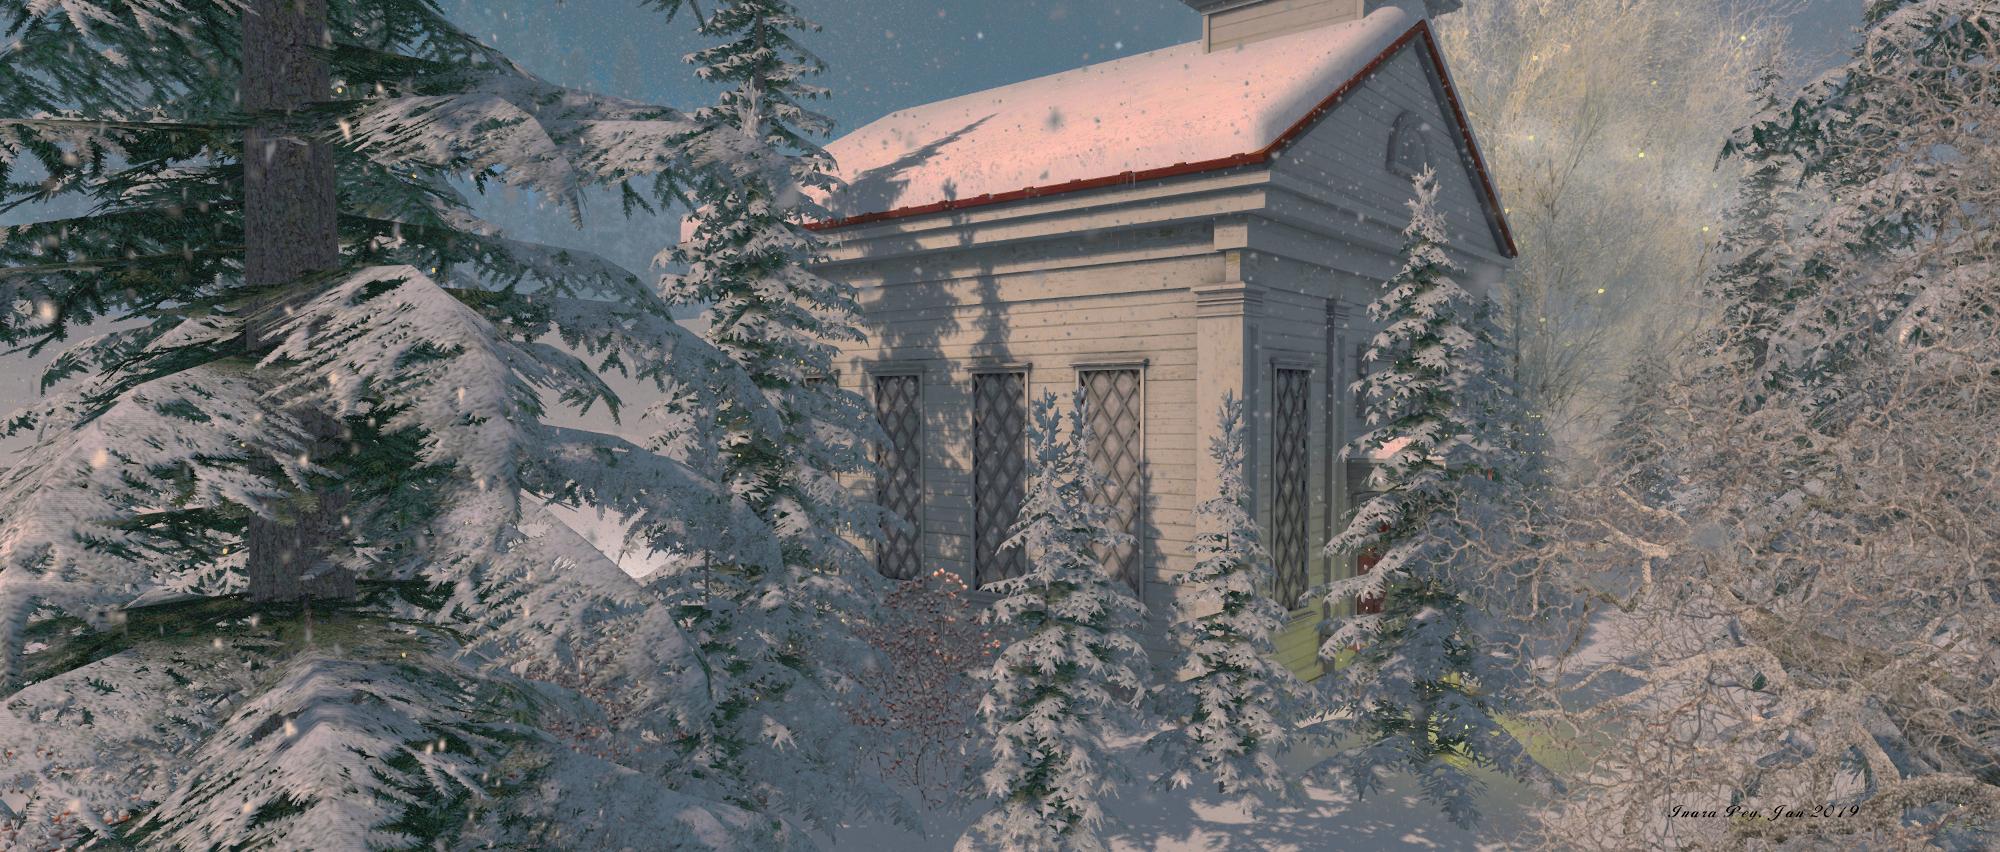 'Tis the Season - Winter Wonderland at Moochie; Inara Pey, January 2019, on Flickr